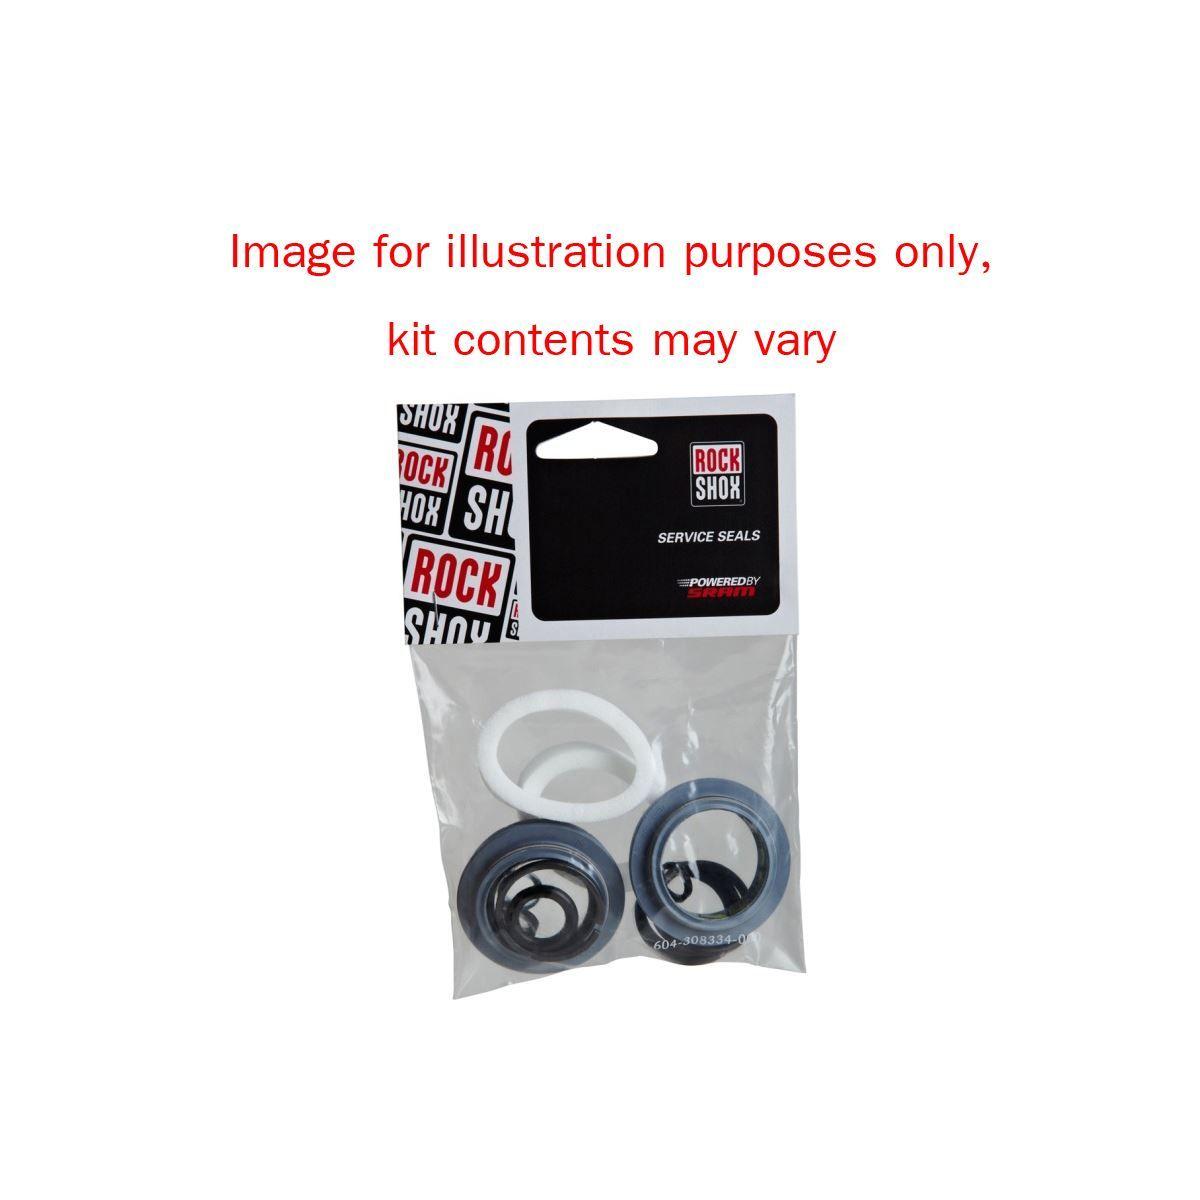 Rockshox Am 2013 Fork Service Kit Basic - Recon Silver: